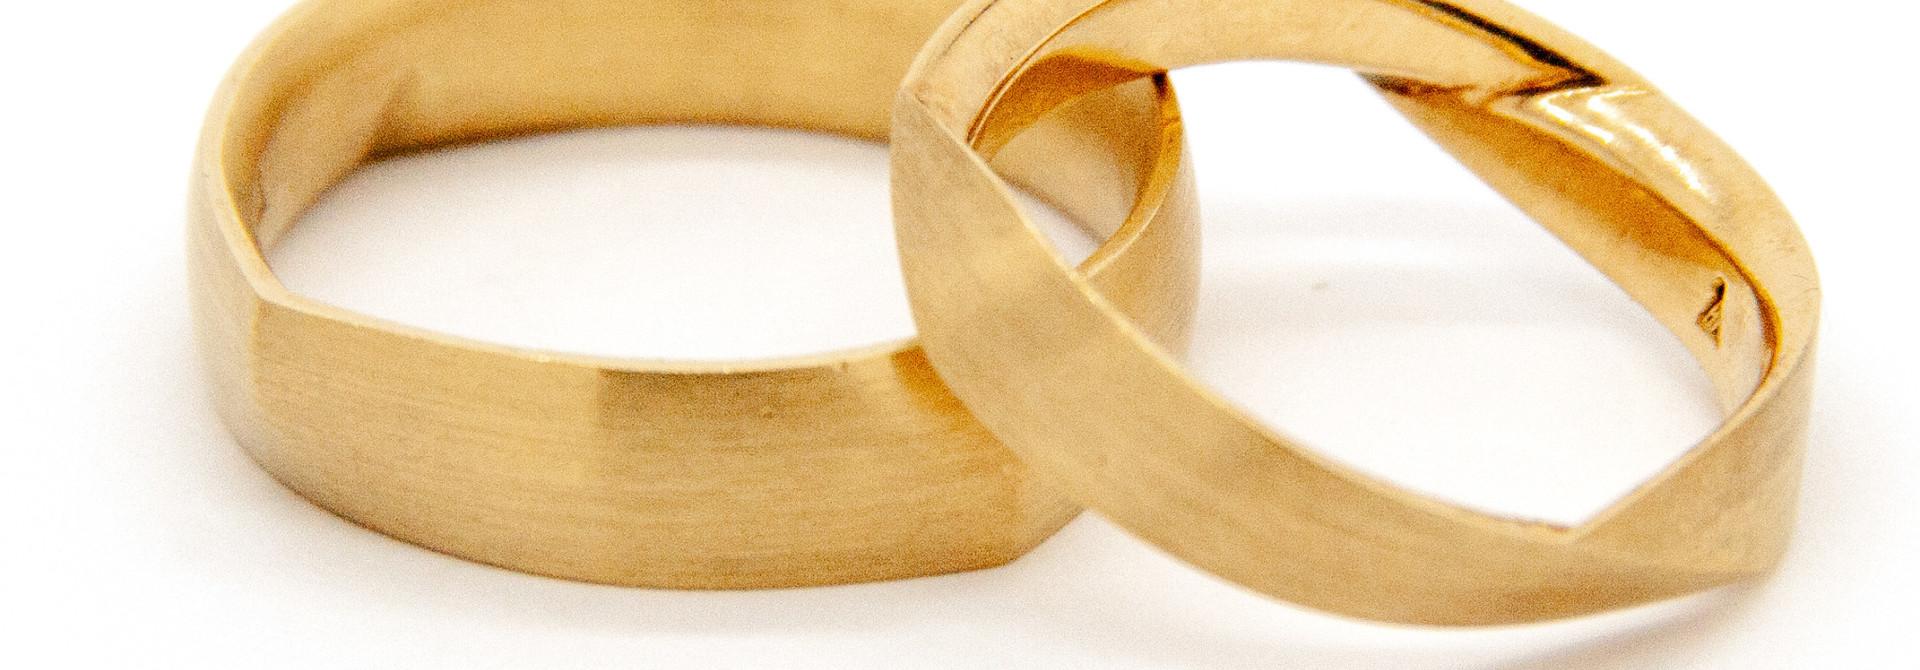 14Krt Geel gouden Trouwring